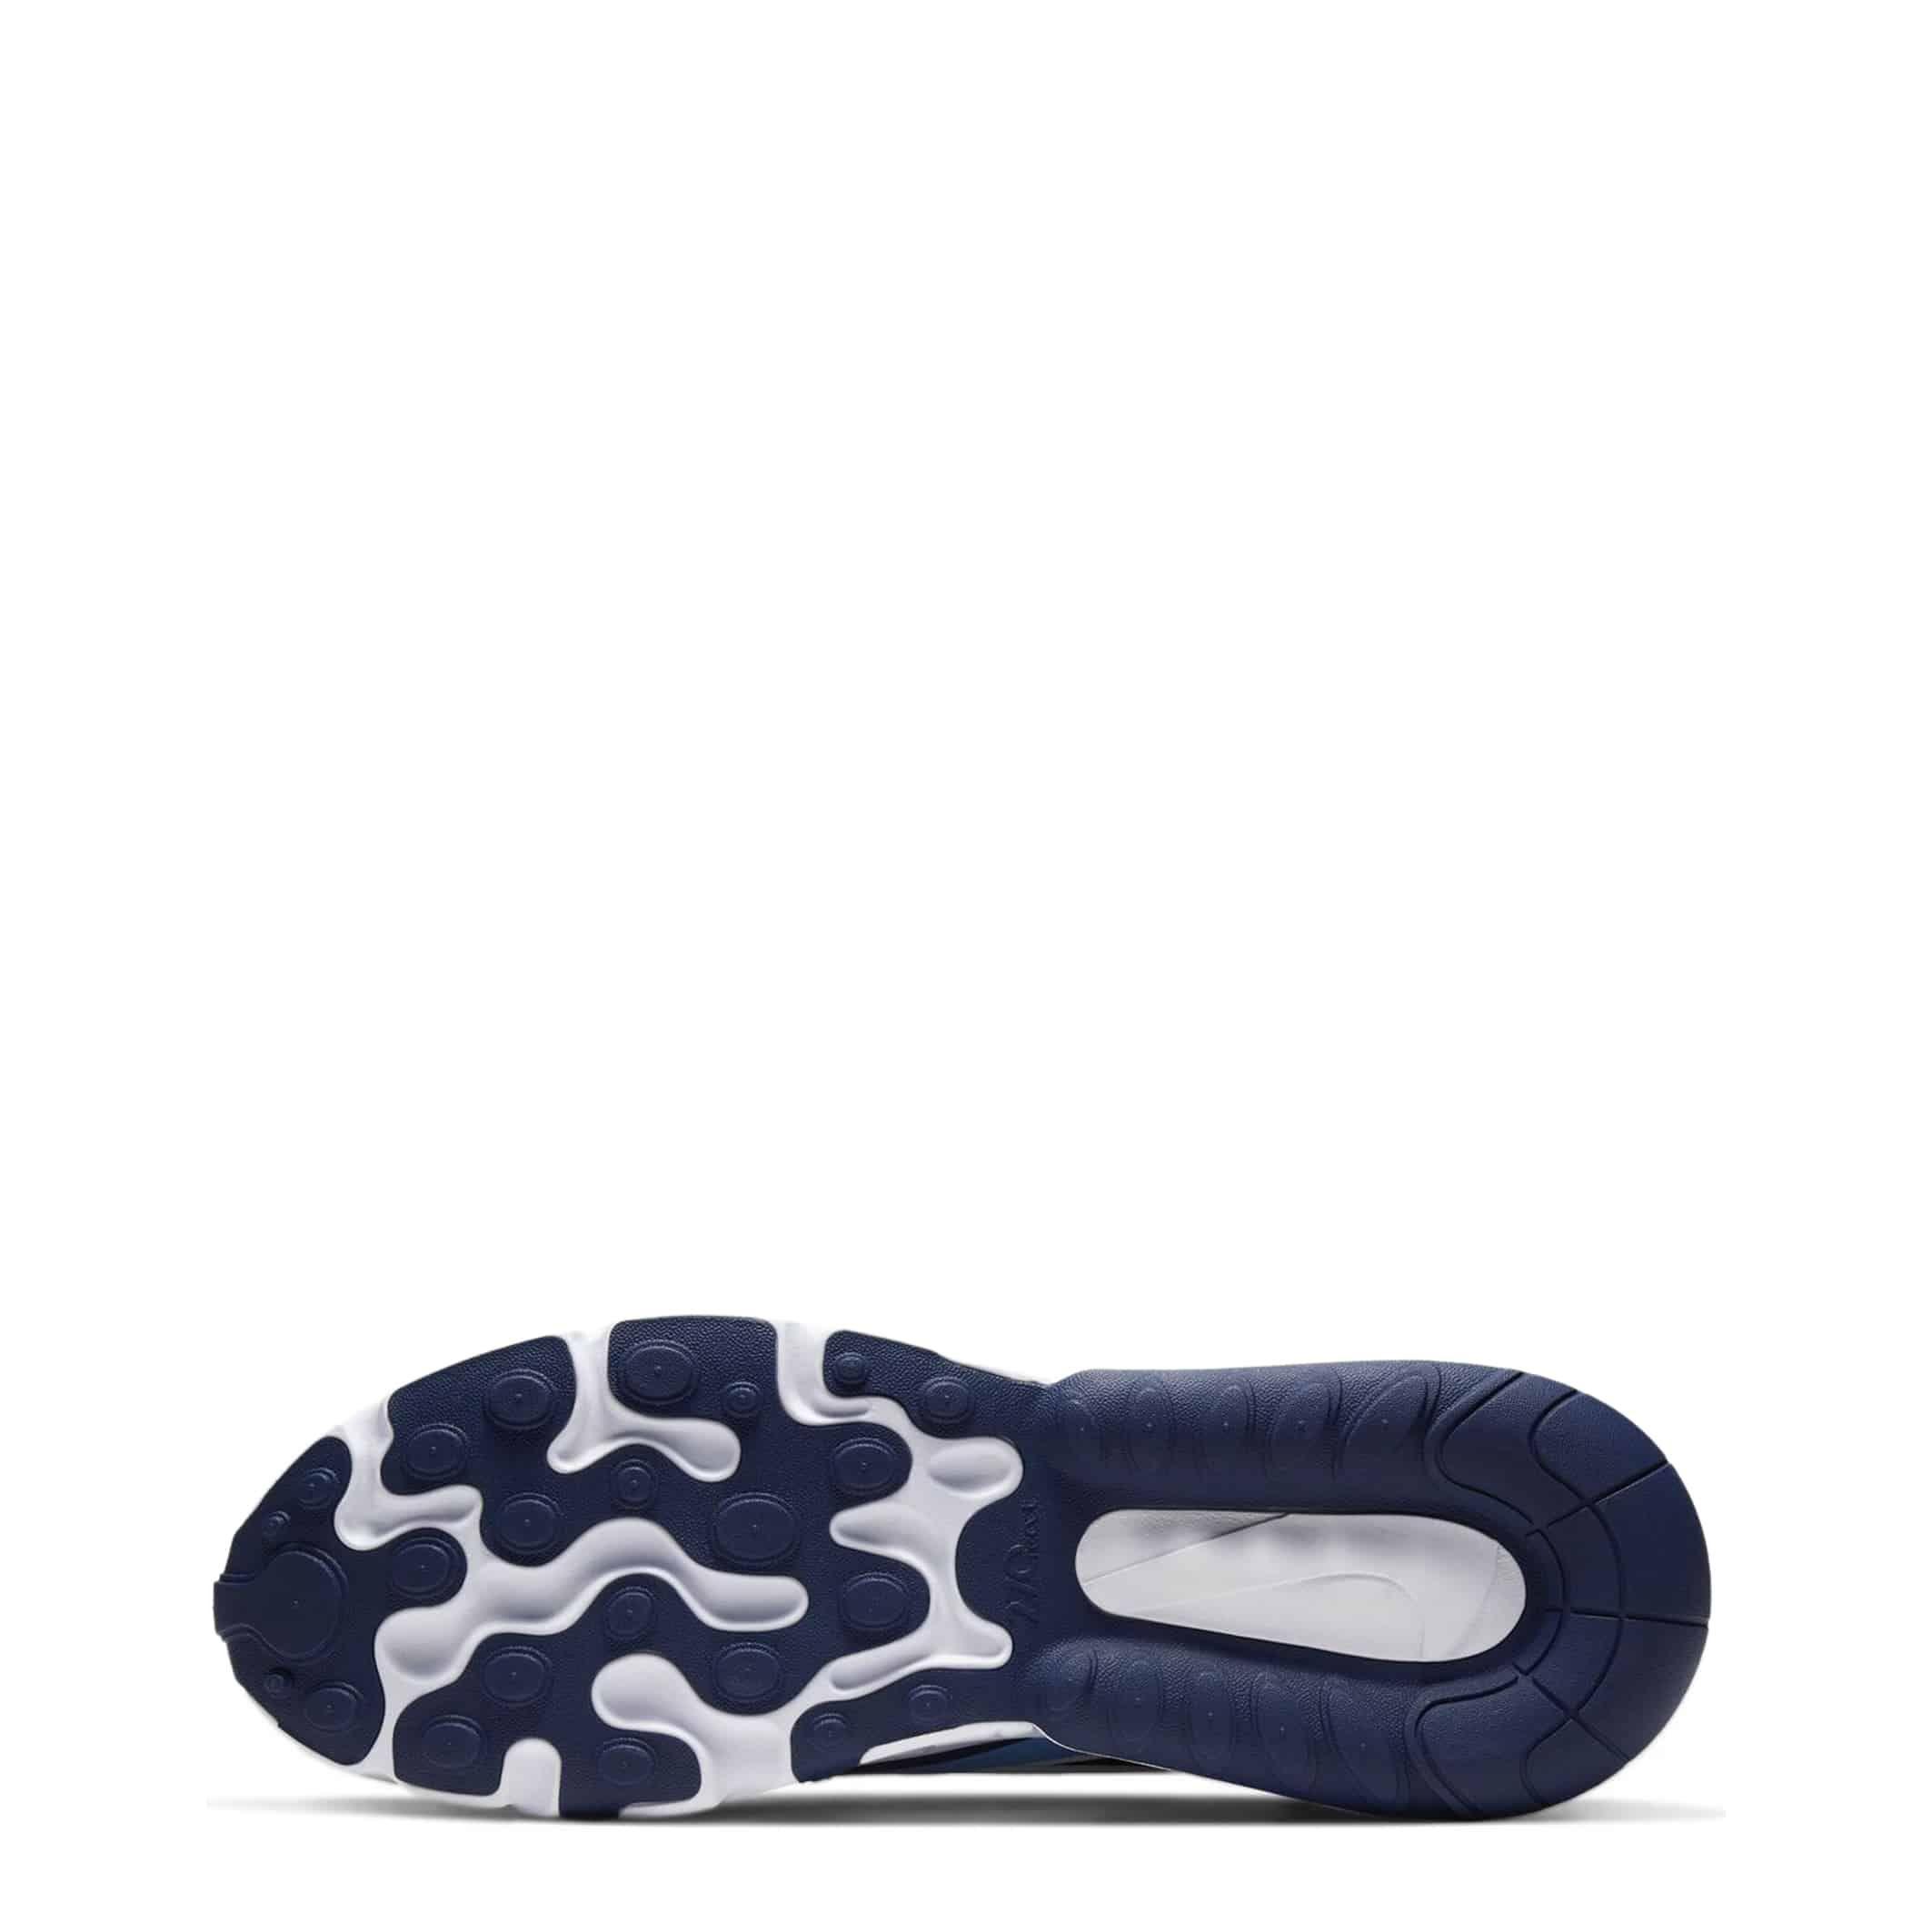 Nike - airmax270react - weiß 4